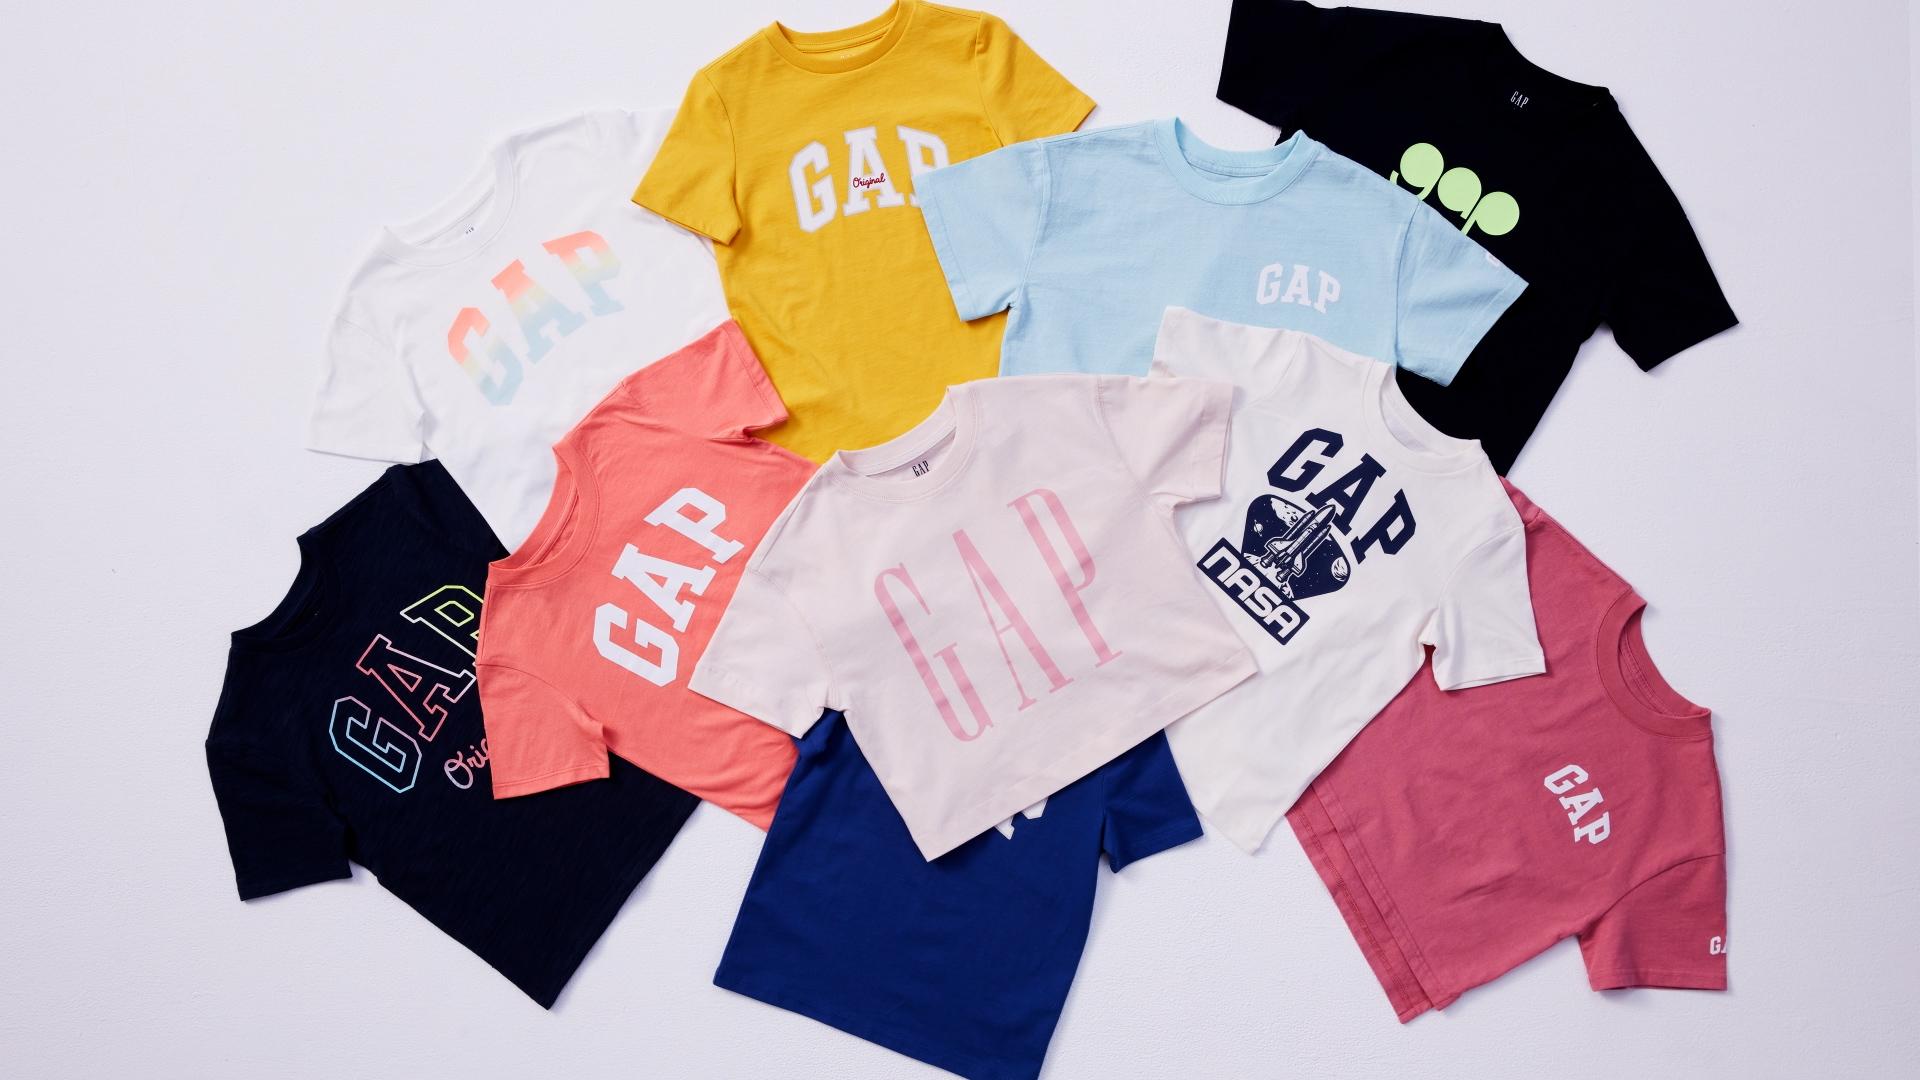 GAPストアでイベント開催!思い出のTシャツでアップサイクル体験【Fasuメンバー限定】